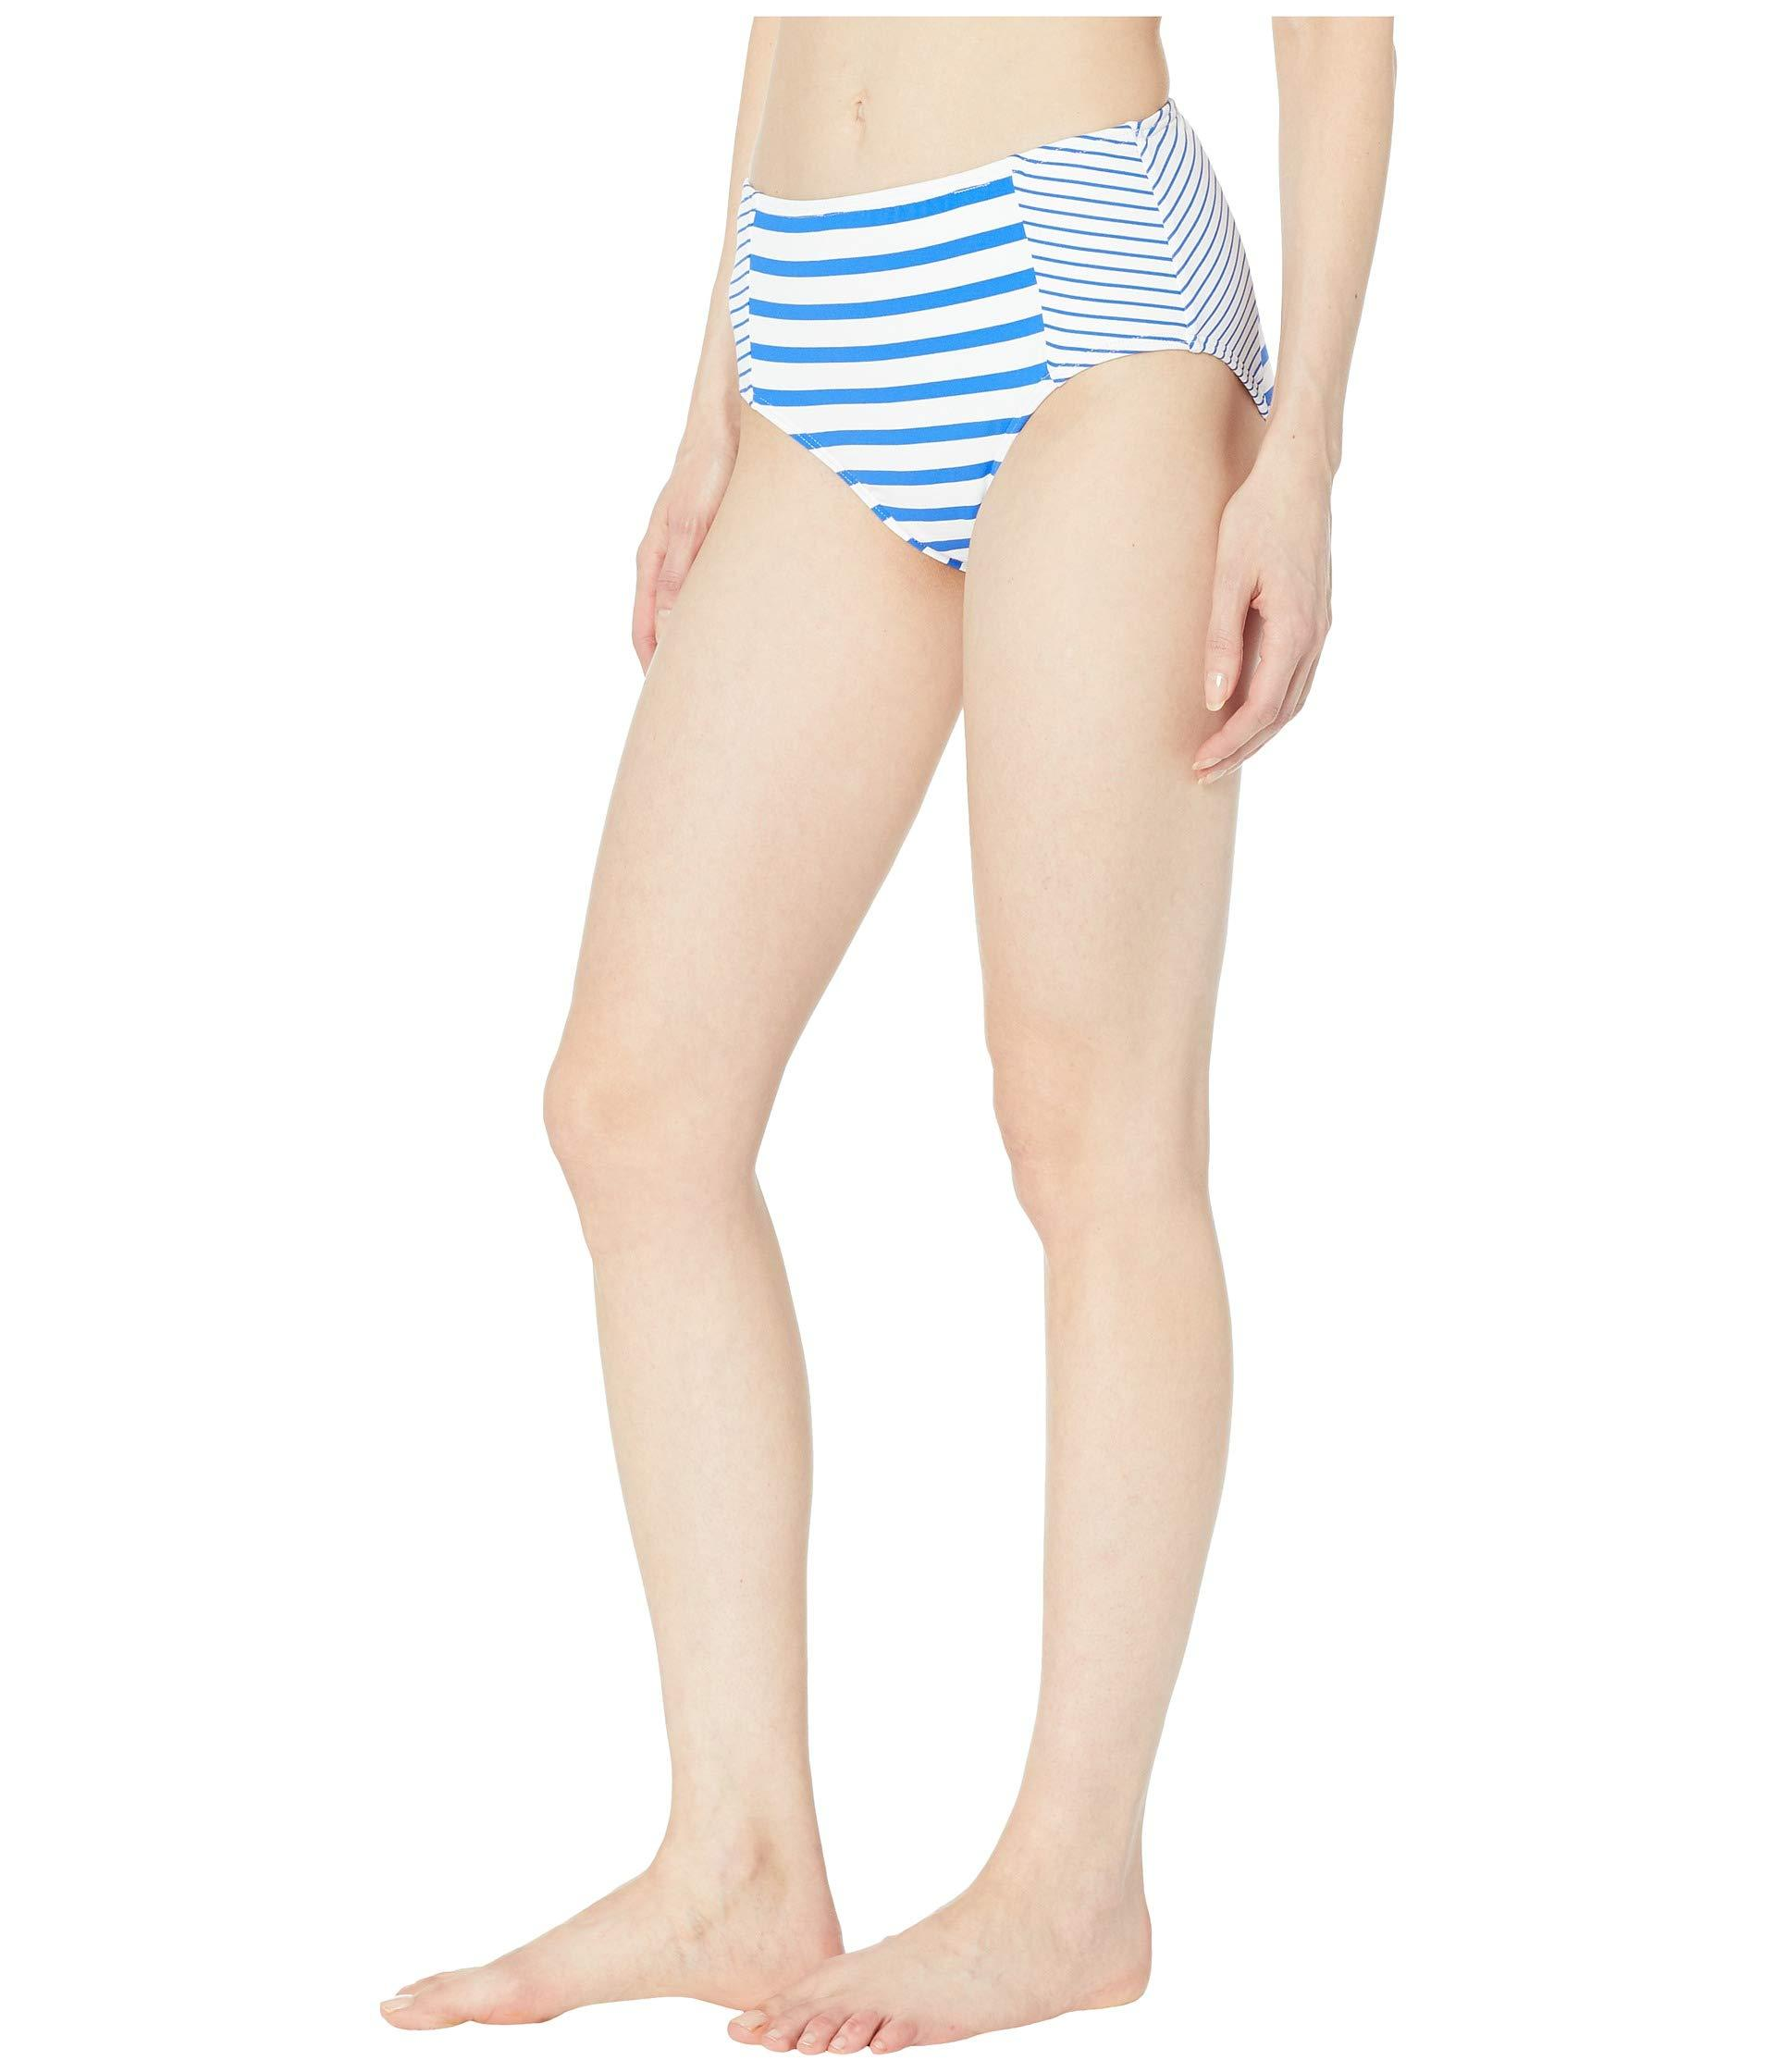 b13885d344 Lyst - Tommy Bahama Beach Glass Stripe High-waisted Bottoms (beach Glass  Blue) Women's Swimwear in Blue